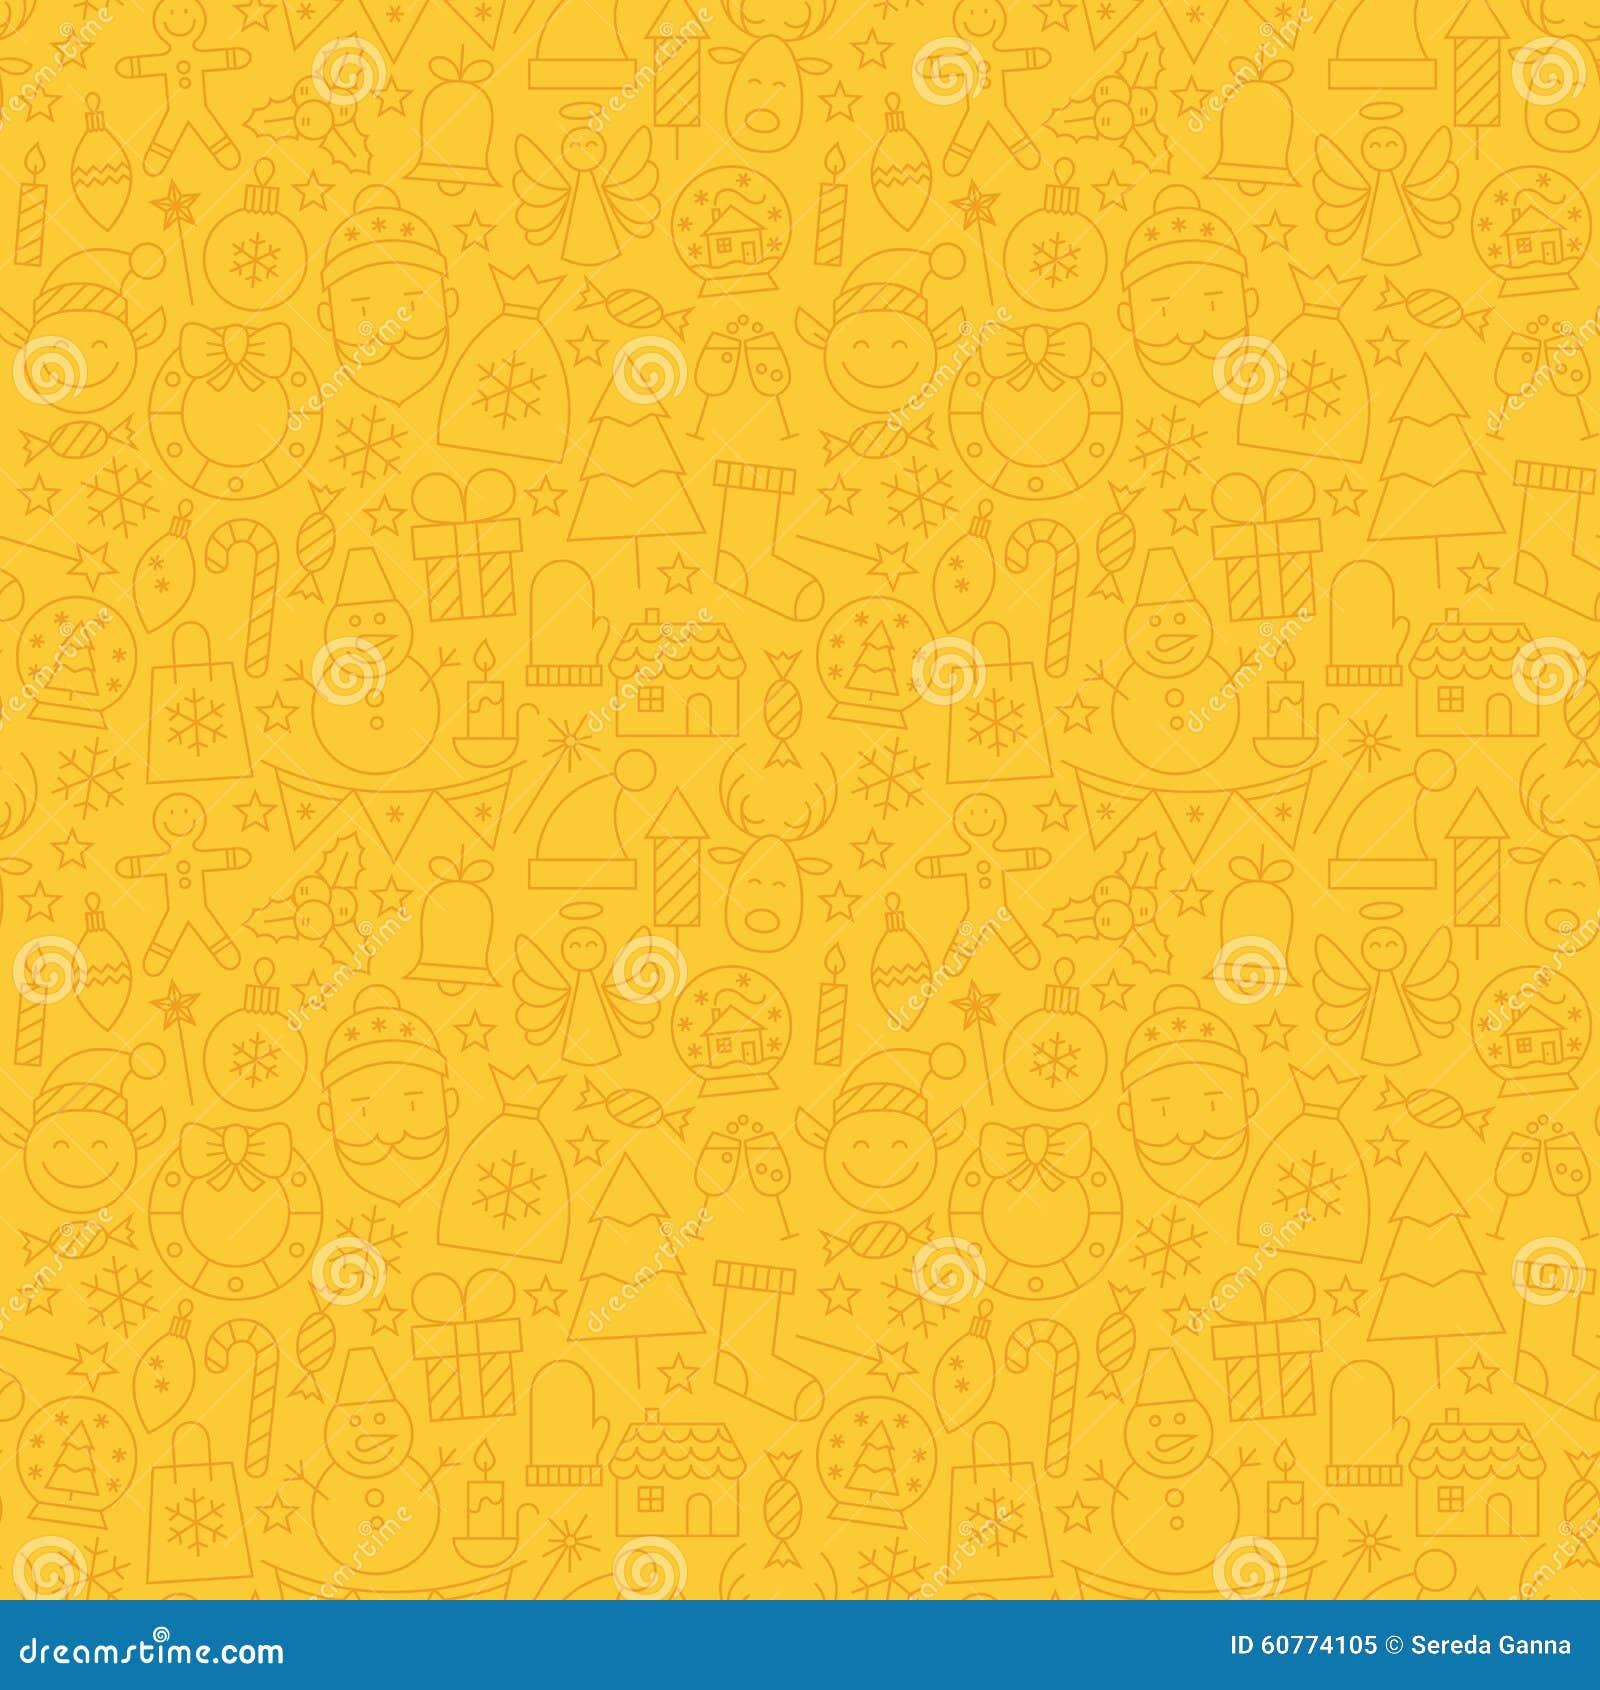 line art happy new year seamless yellow pattern